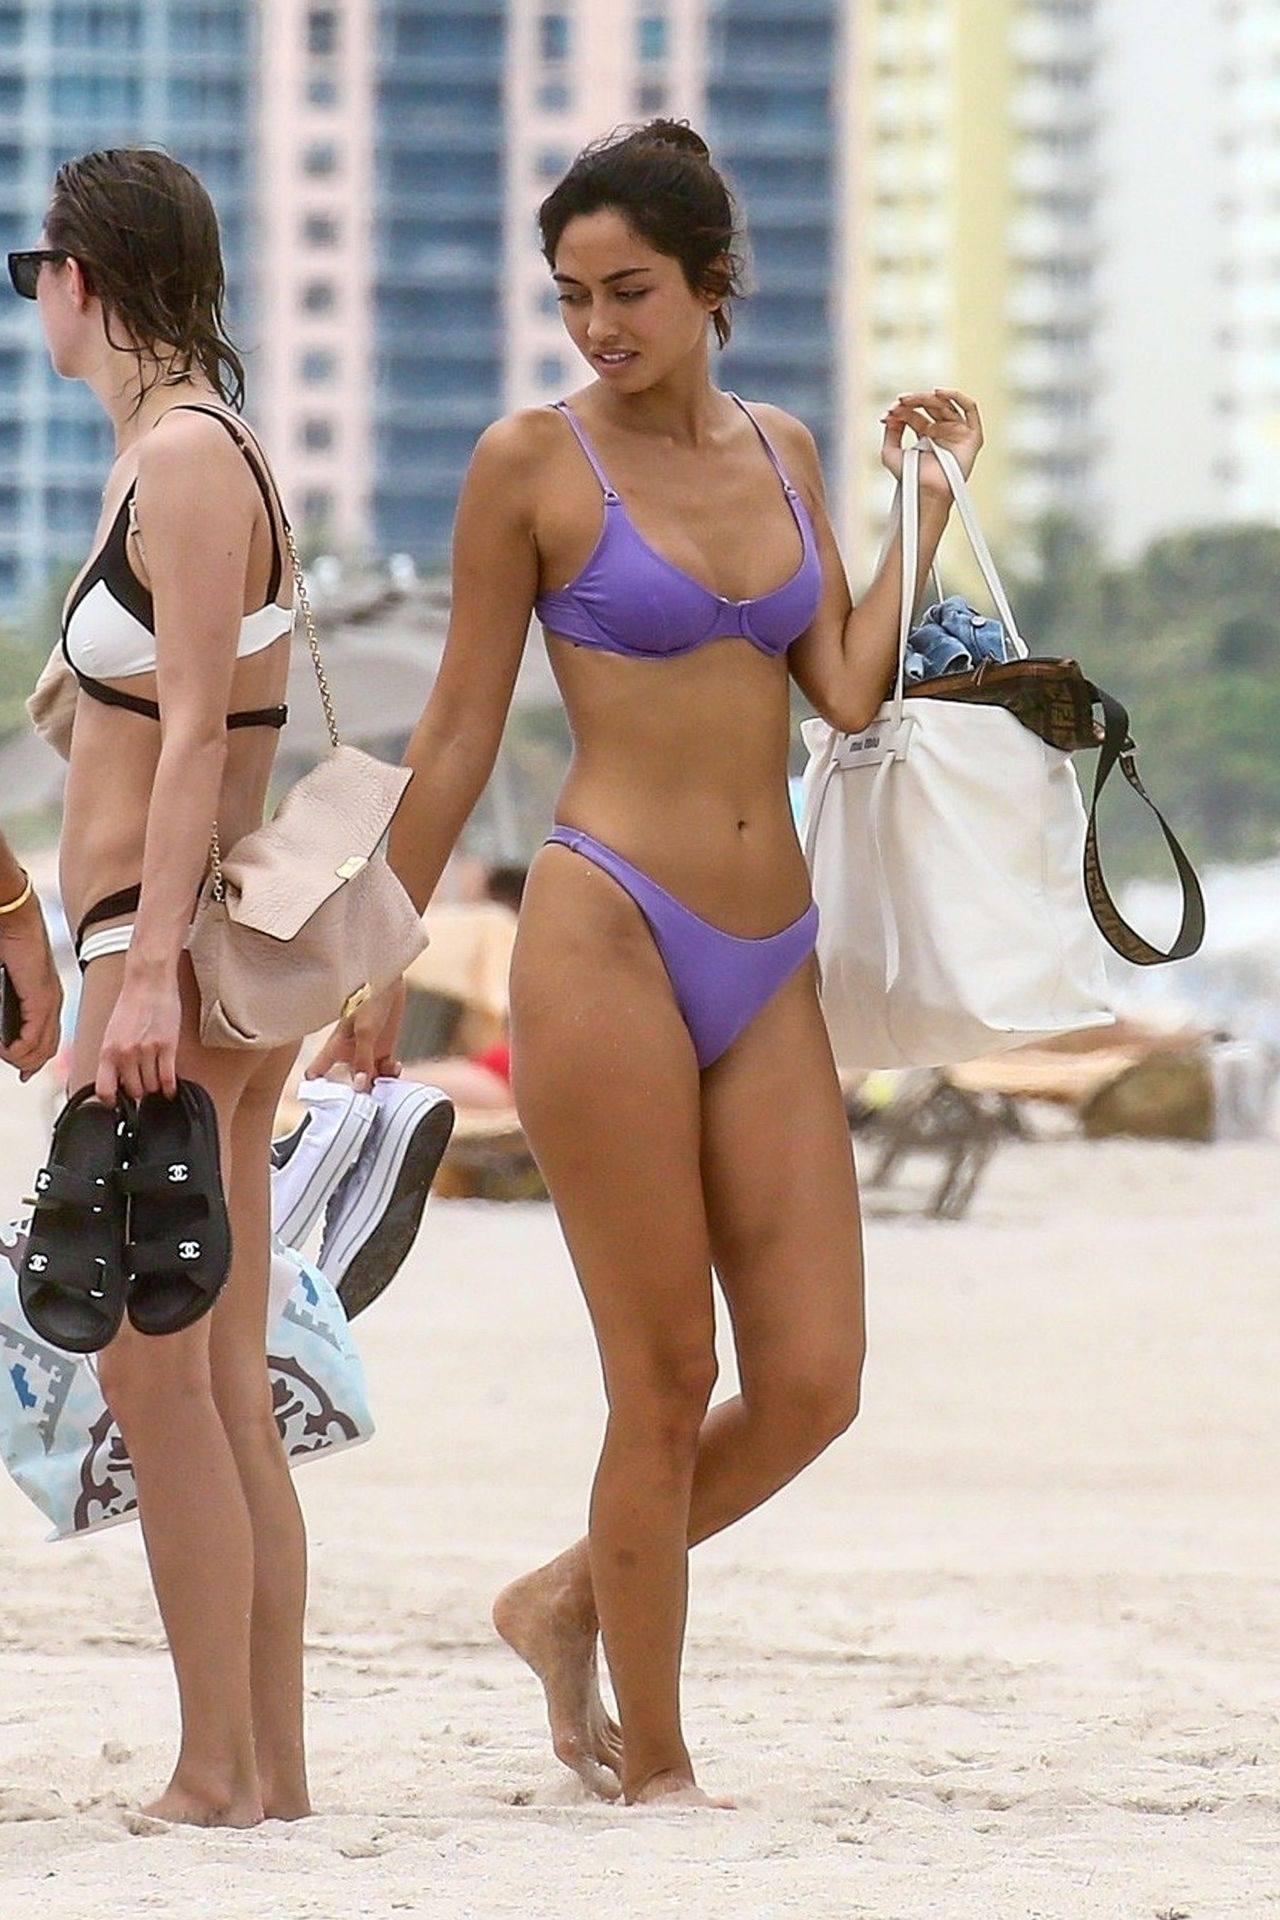 Ambra Gutierrez – Hot Body In Small Bikini On Beach In Miami Beach 0022